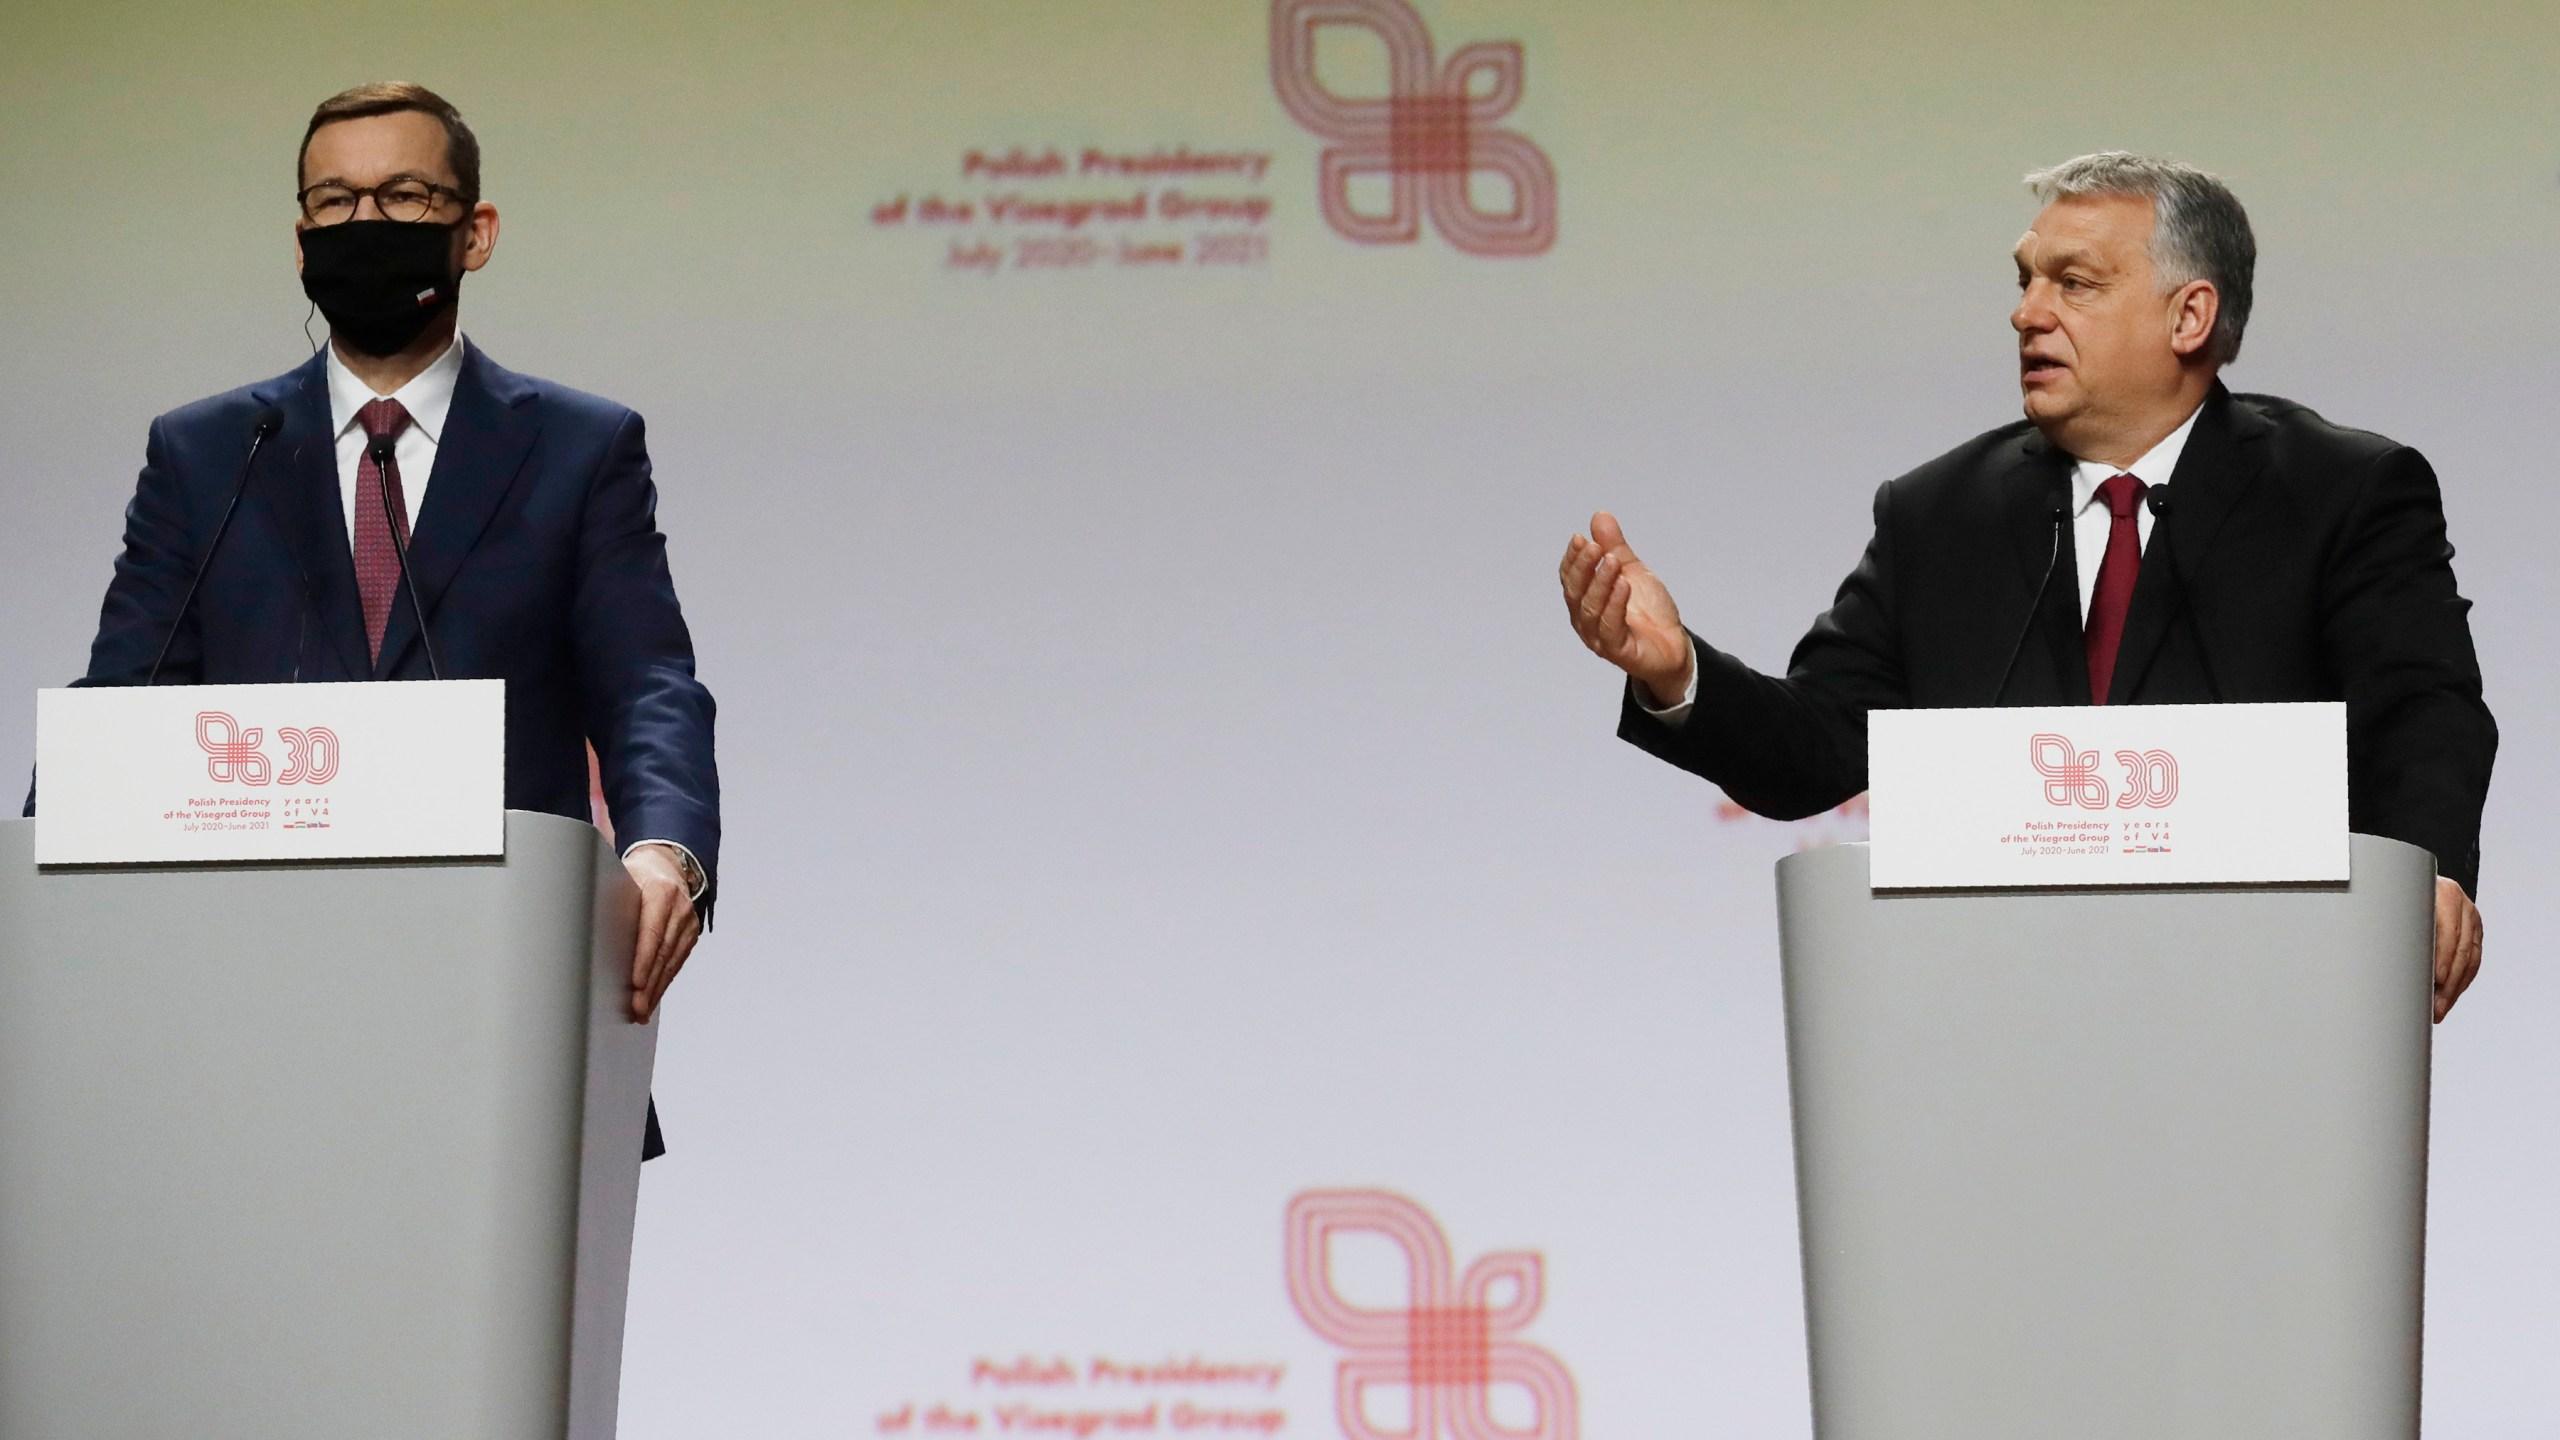 Viktor Orban, Mateusz Morawiecki